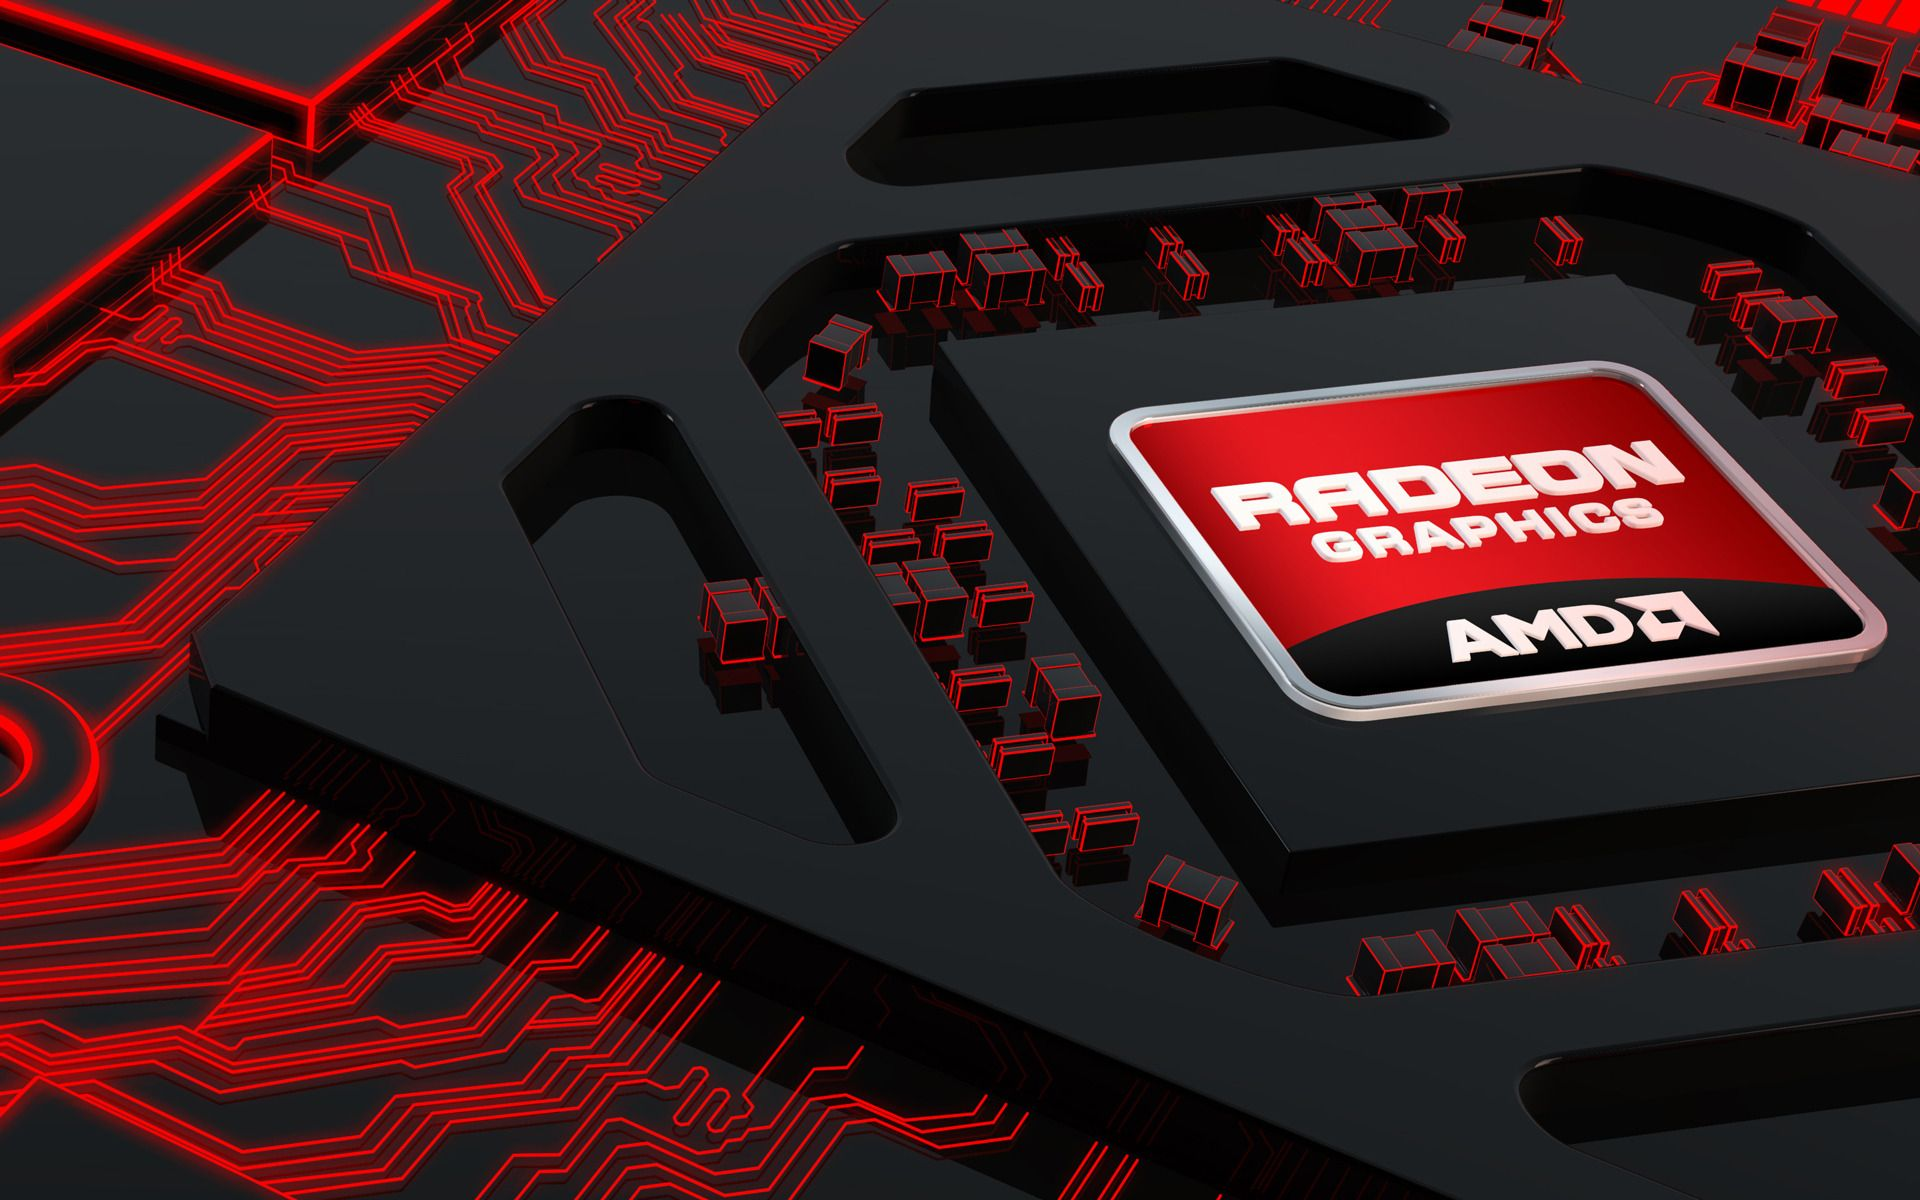 Amd Radeon Rx 550 Review A Thrilling Budget Graphics Card Https Webpostingpro Com Amd Radeon Rx 550 Review A Thrilling Budge Graphic Card Amd Best Laptops